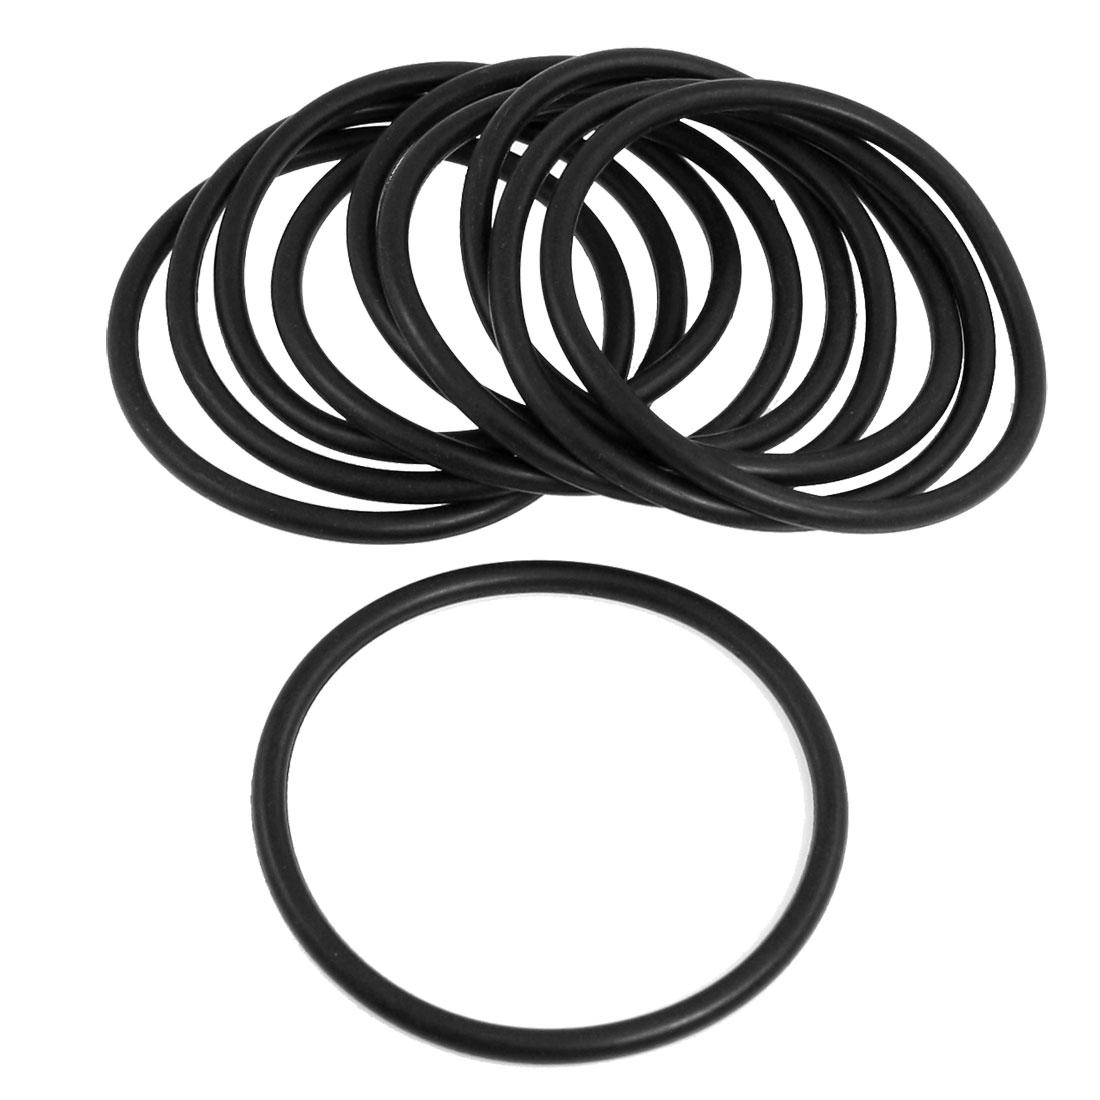 10 Pcs Nitrile Rubber O Ring NBR Gasket Grommets 80mm x 5mm